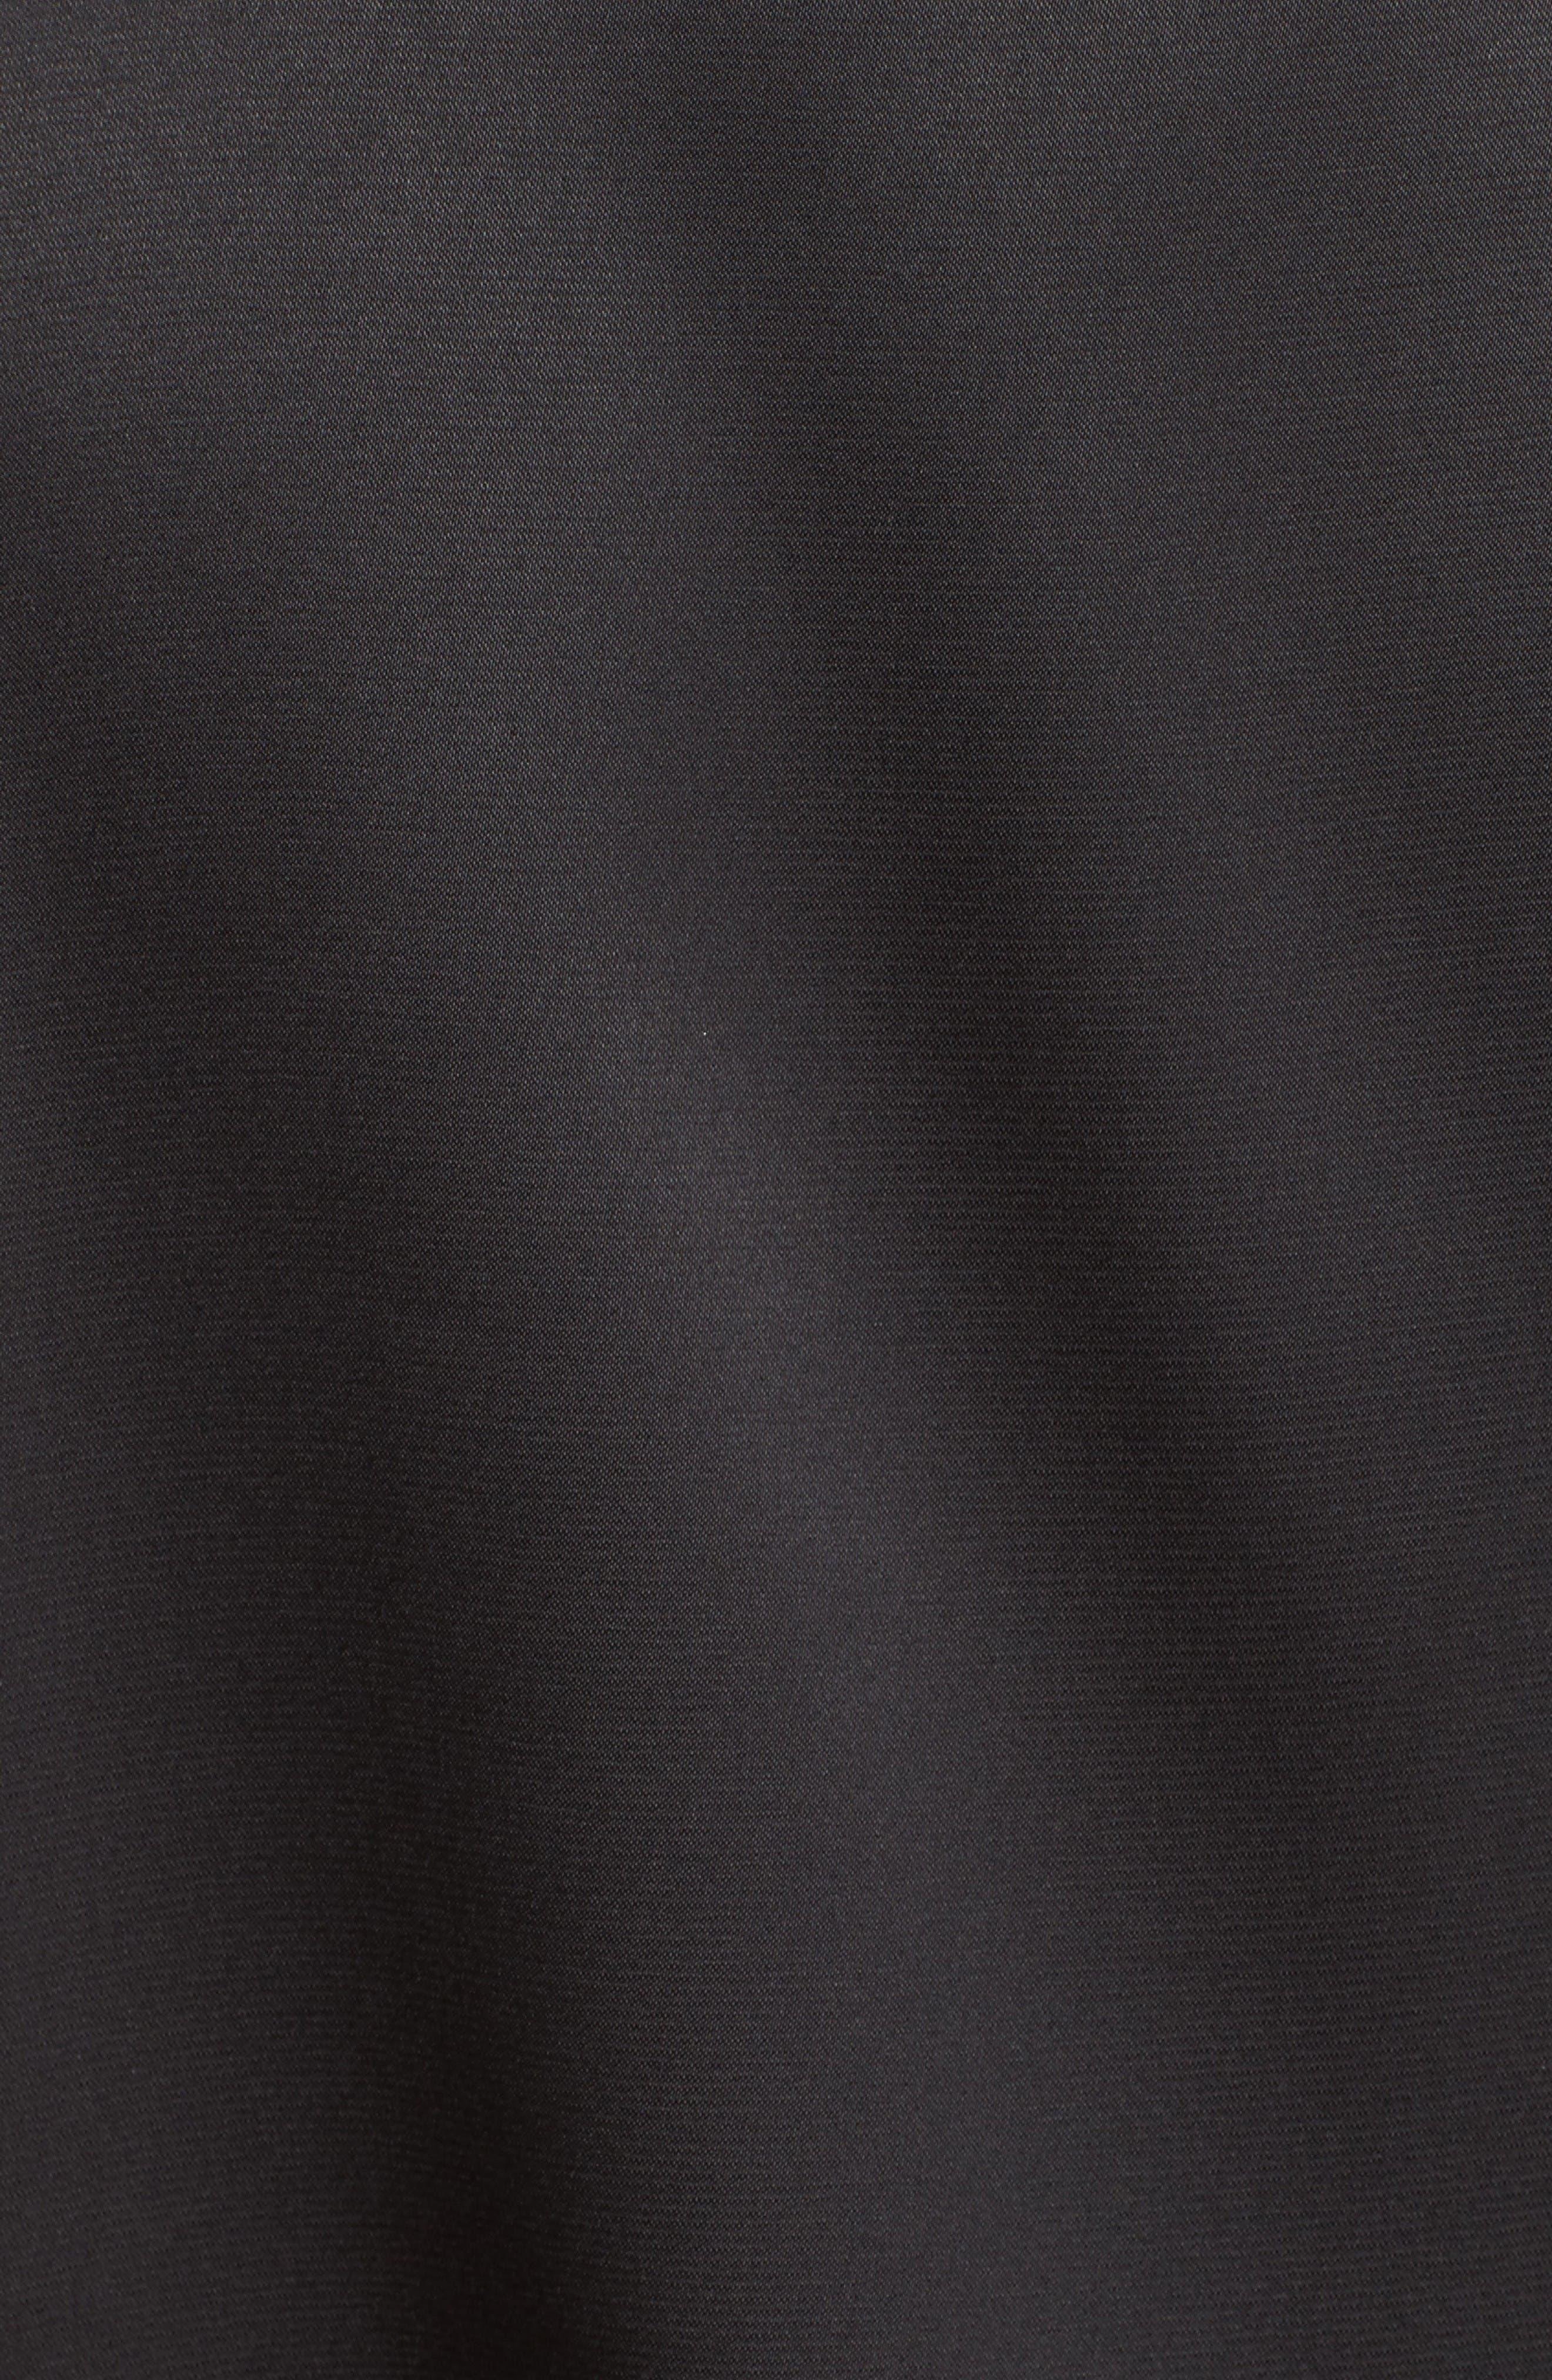 Satin Bomber Jacket,                             Alternate thumbnail 6, color,                             Black